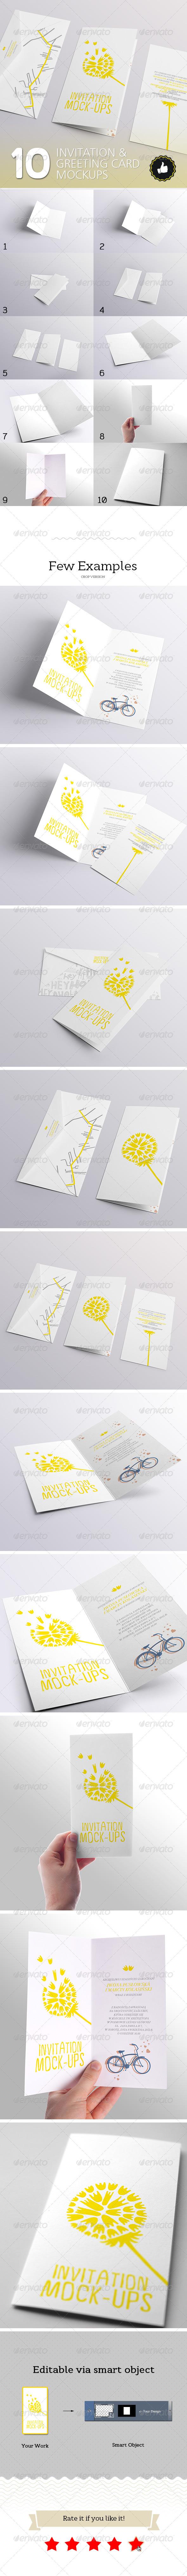 GraphicRiver 10 Invitation & Greeting Card Mockups 5705108